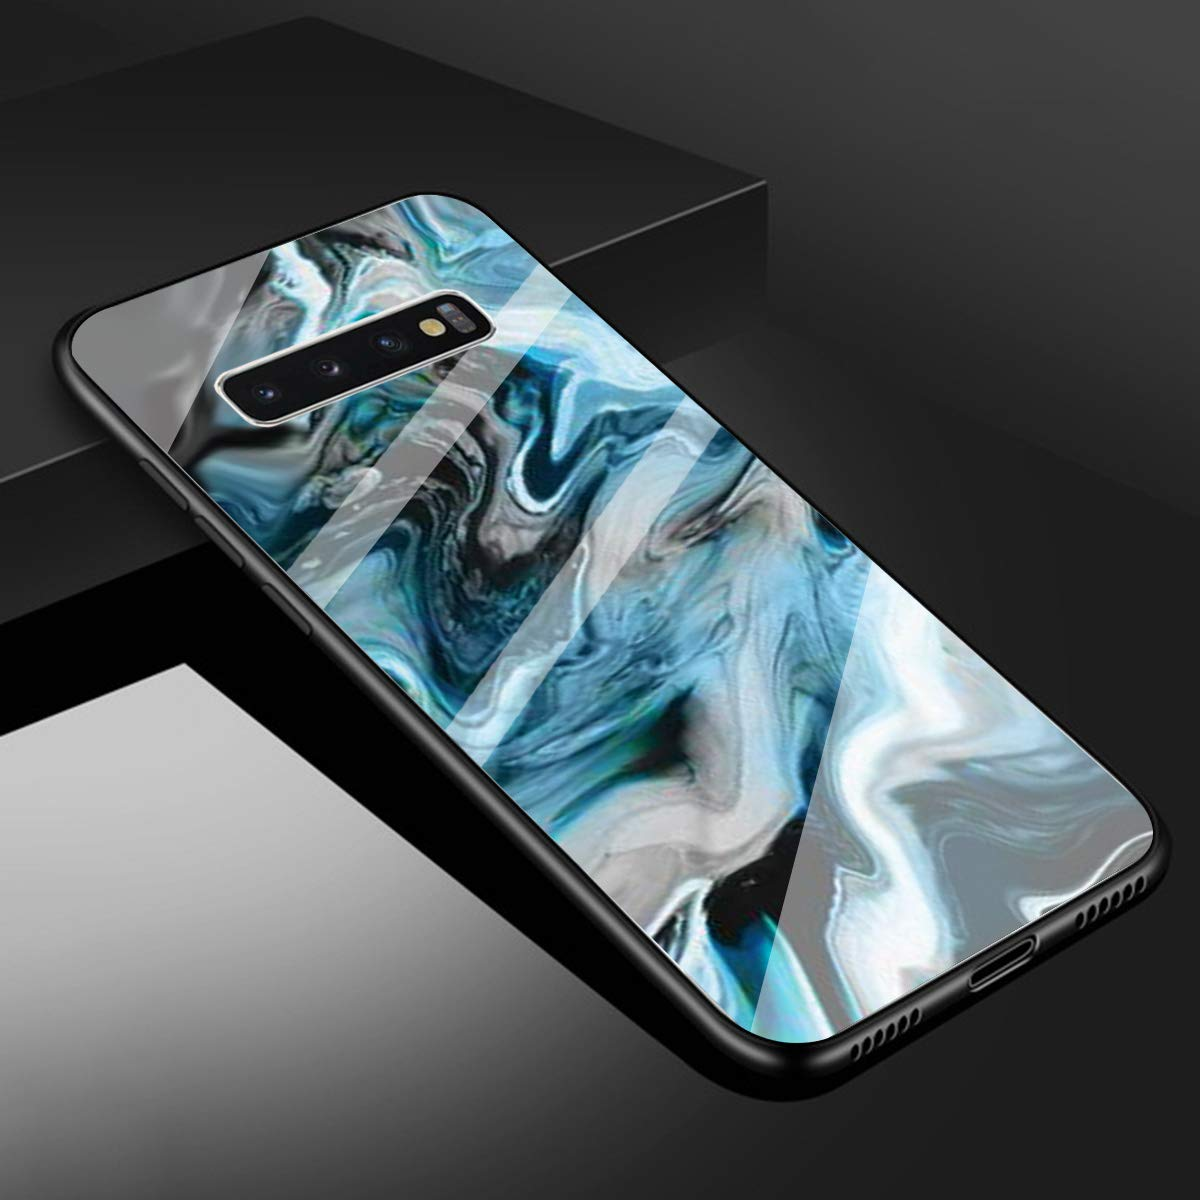 Funda Samsung S10 Plus Silicona Antigolpes Cubierta Protector Bumper Vidrio Templado Contraportada Carcasa Cover Negro EuCase Funda Glass Marble para Samsung S10 Plus